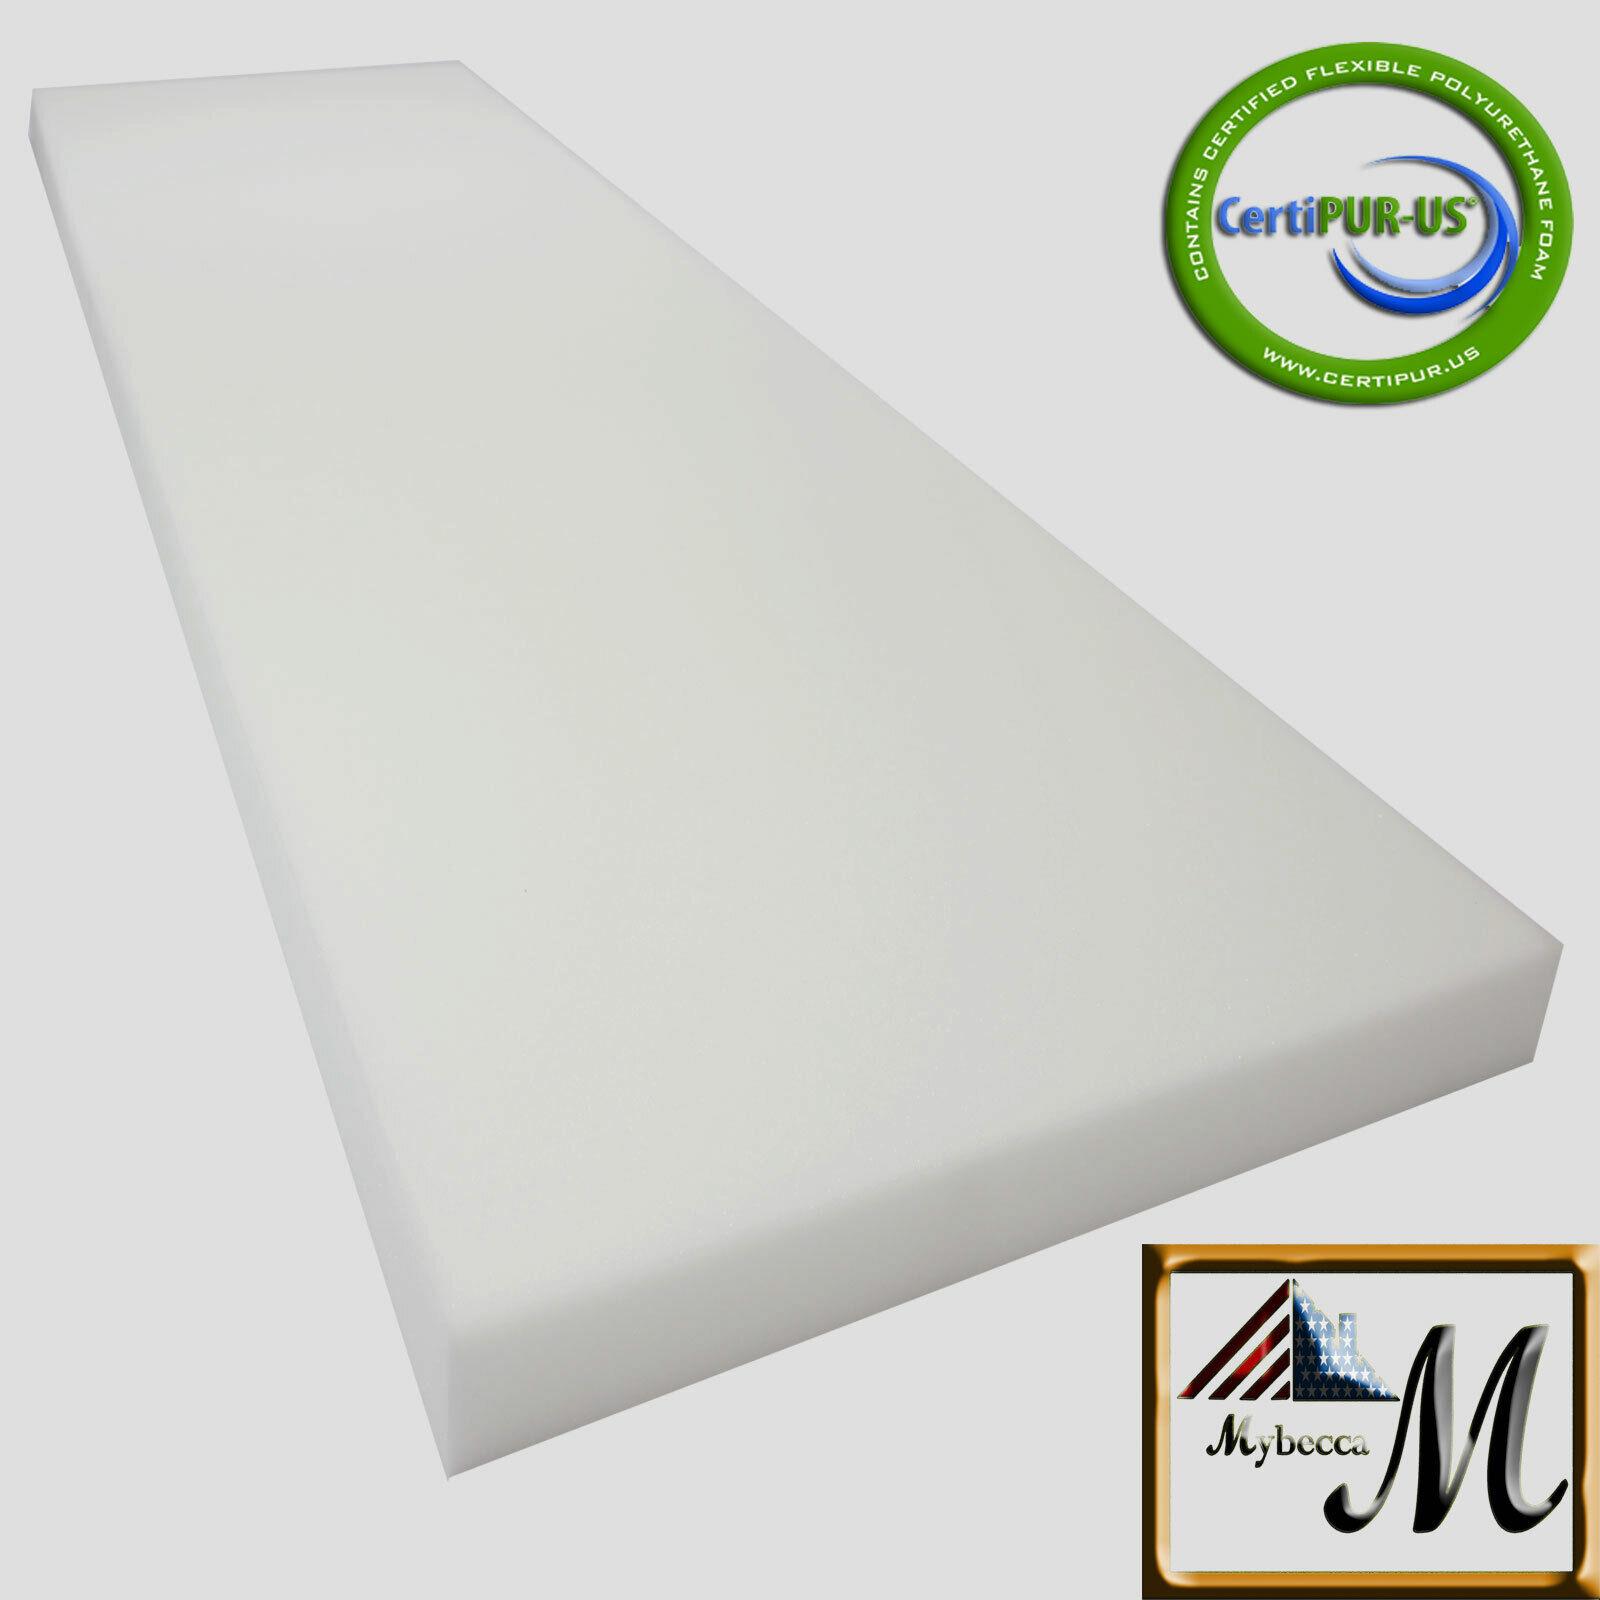 Medium Density Mybecca Upholstery Foam Cushion Seat Replacem